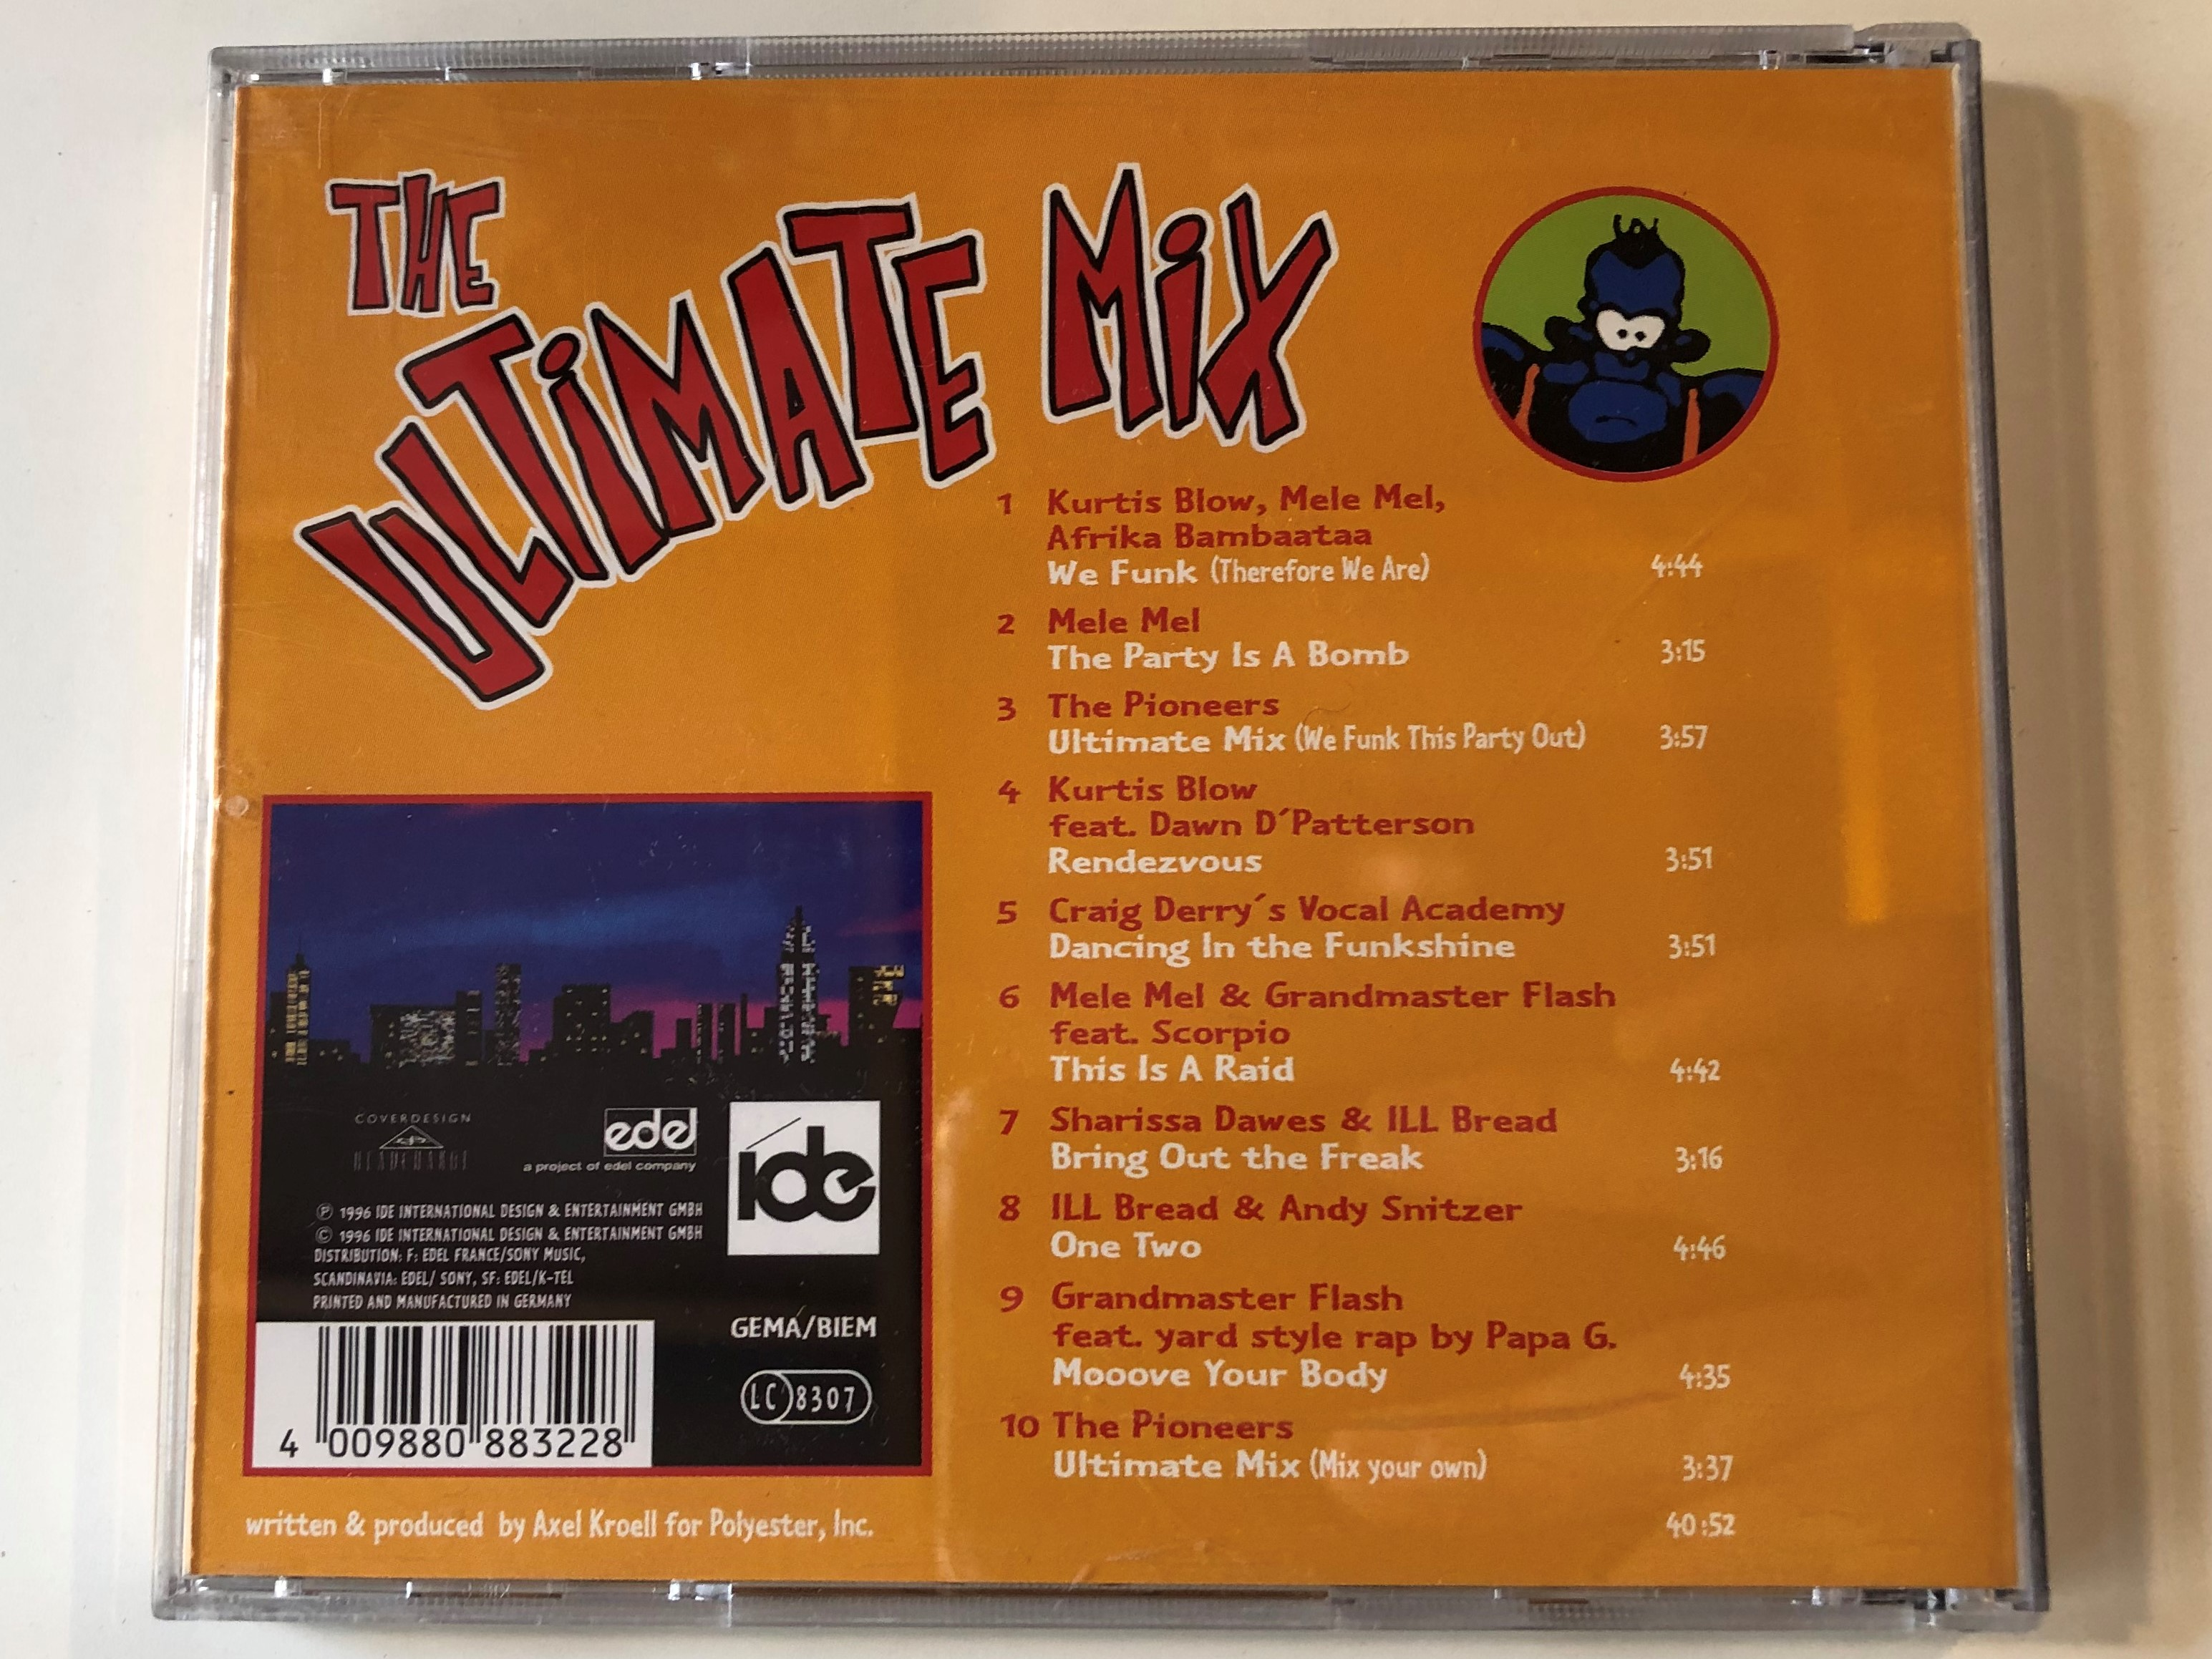 the-ultimate-mix-feat.-the-godfathers-of-rap-afrika-bambaataa-kurtis-blow-mele-mel-grandmaster-flash-ill-bread-sharissa-dawes-papa-g.-ide-audio-cd-1996-0088322ide-3-.jpg